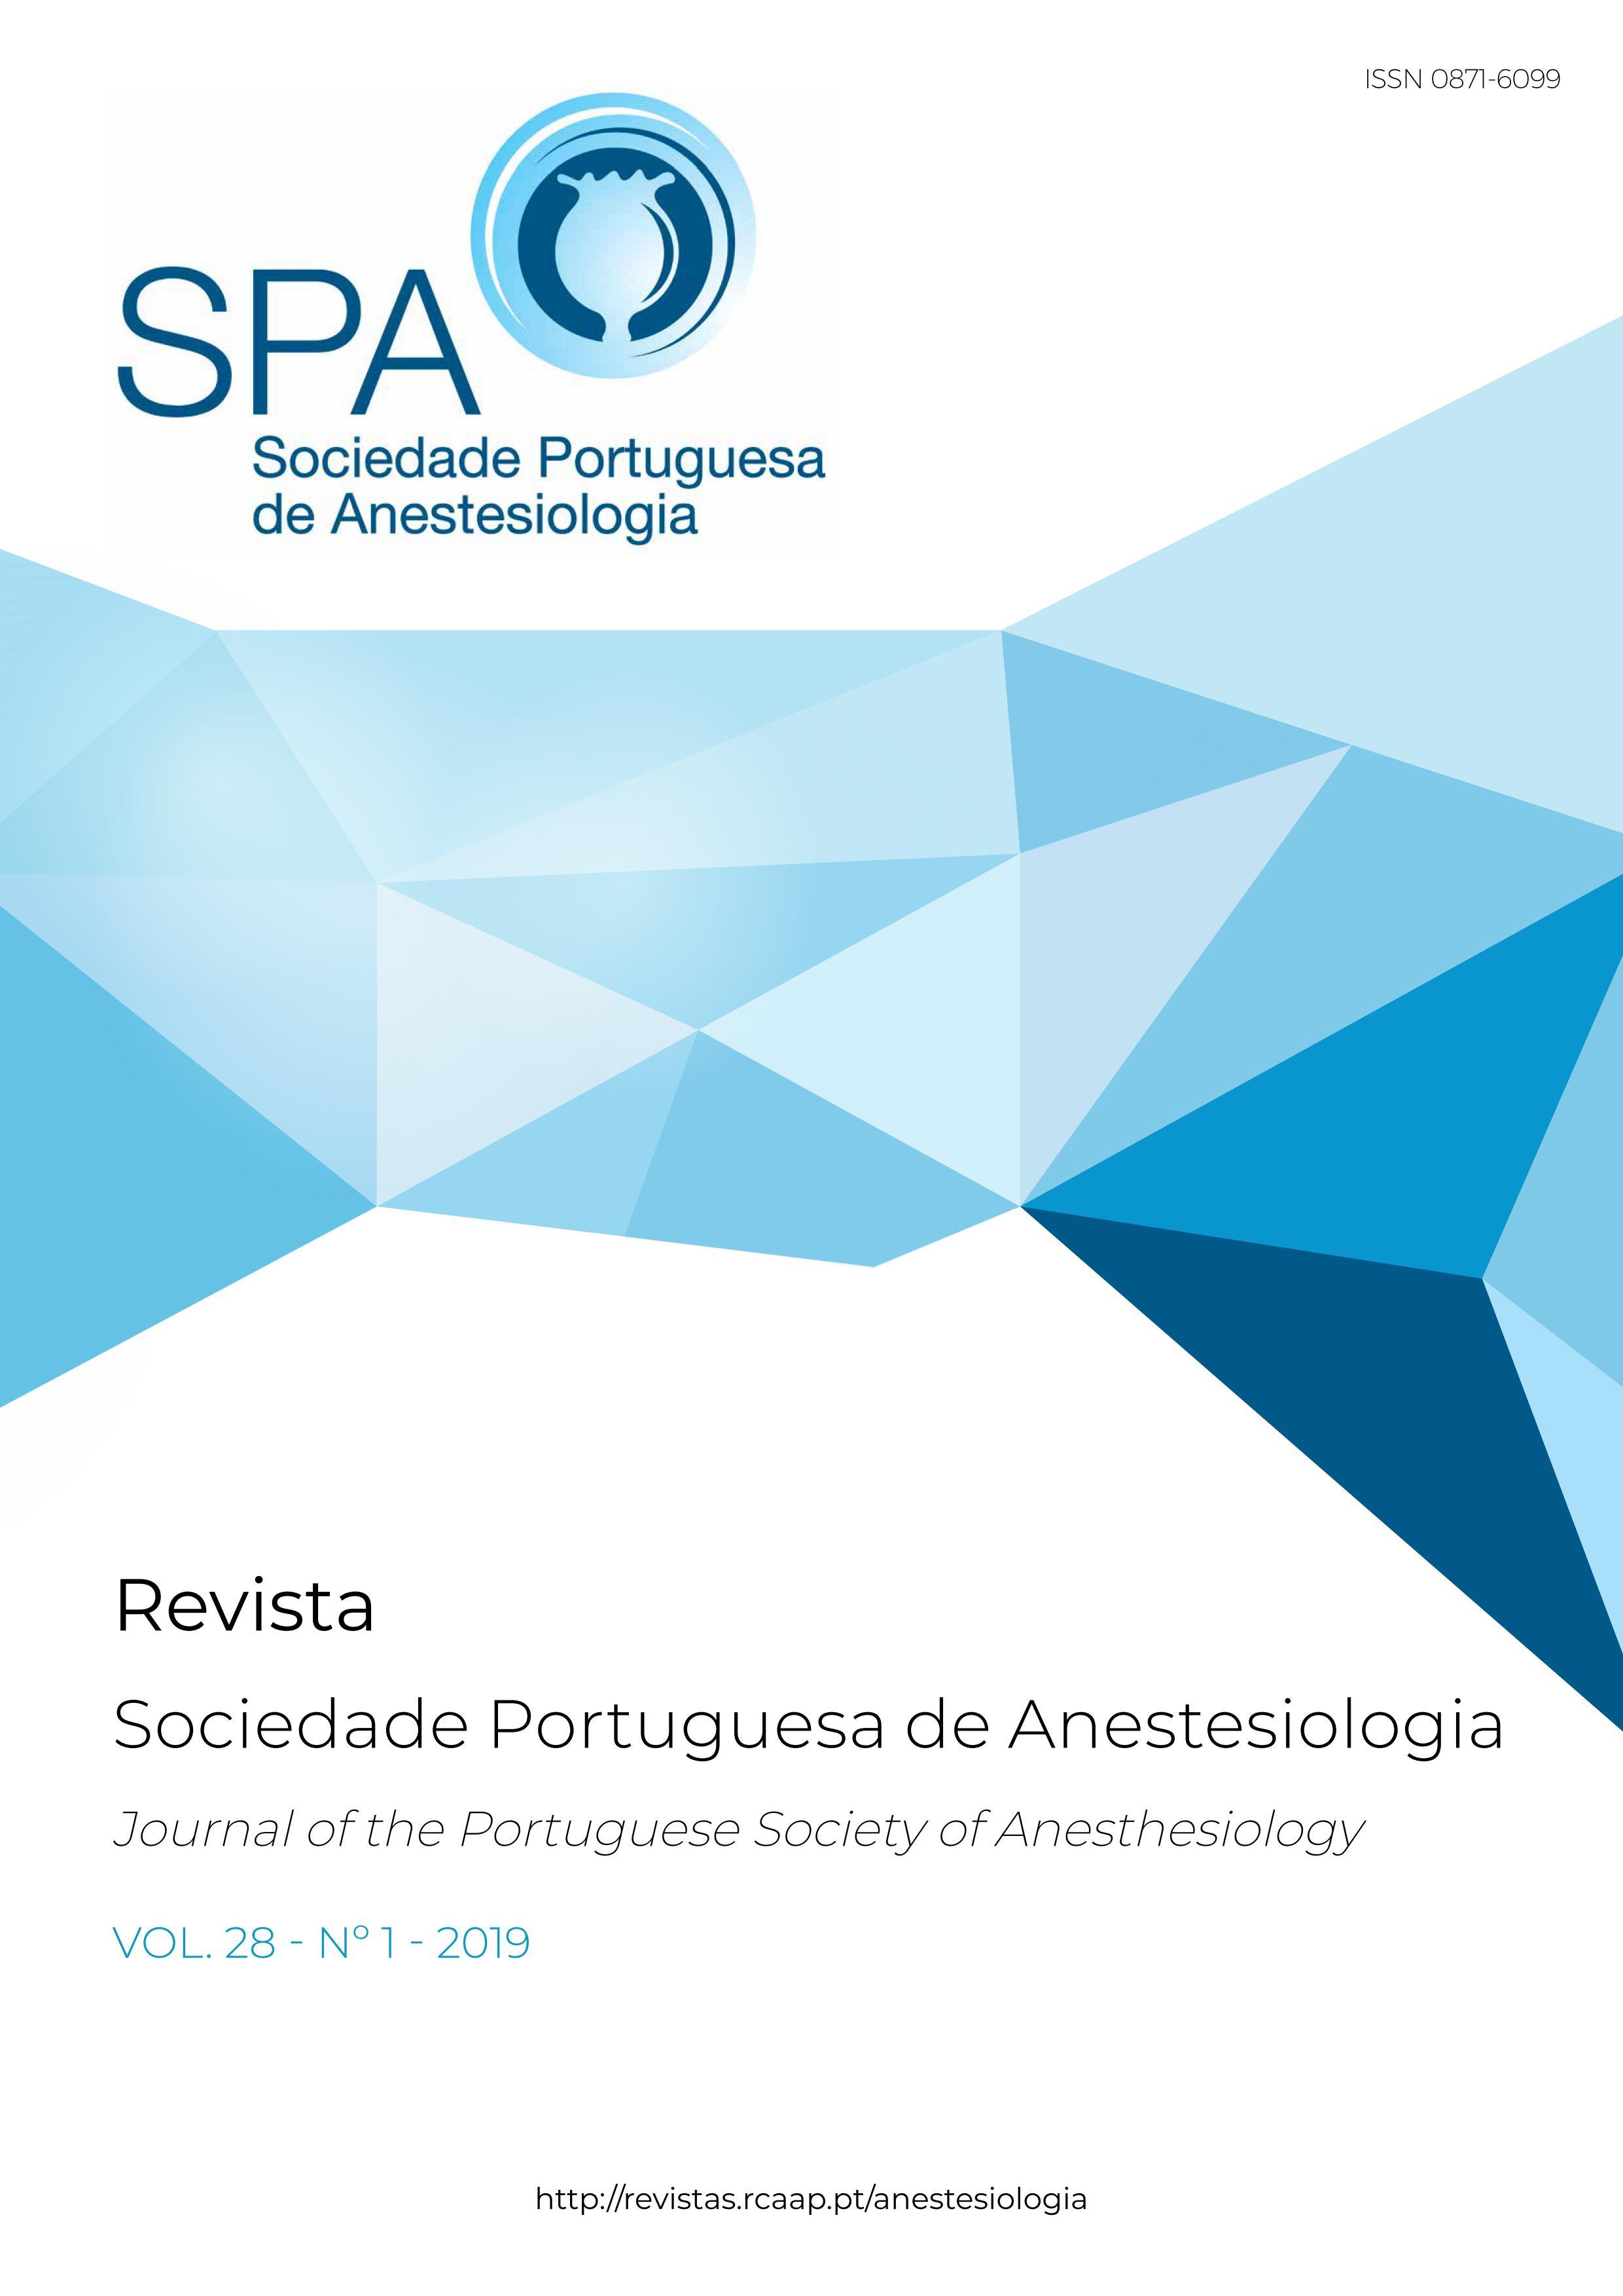 Ver Vol. 28 N.º 1 (2019): Revista da Sociedade Portuguesa de Anestesiologia